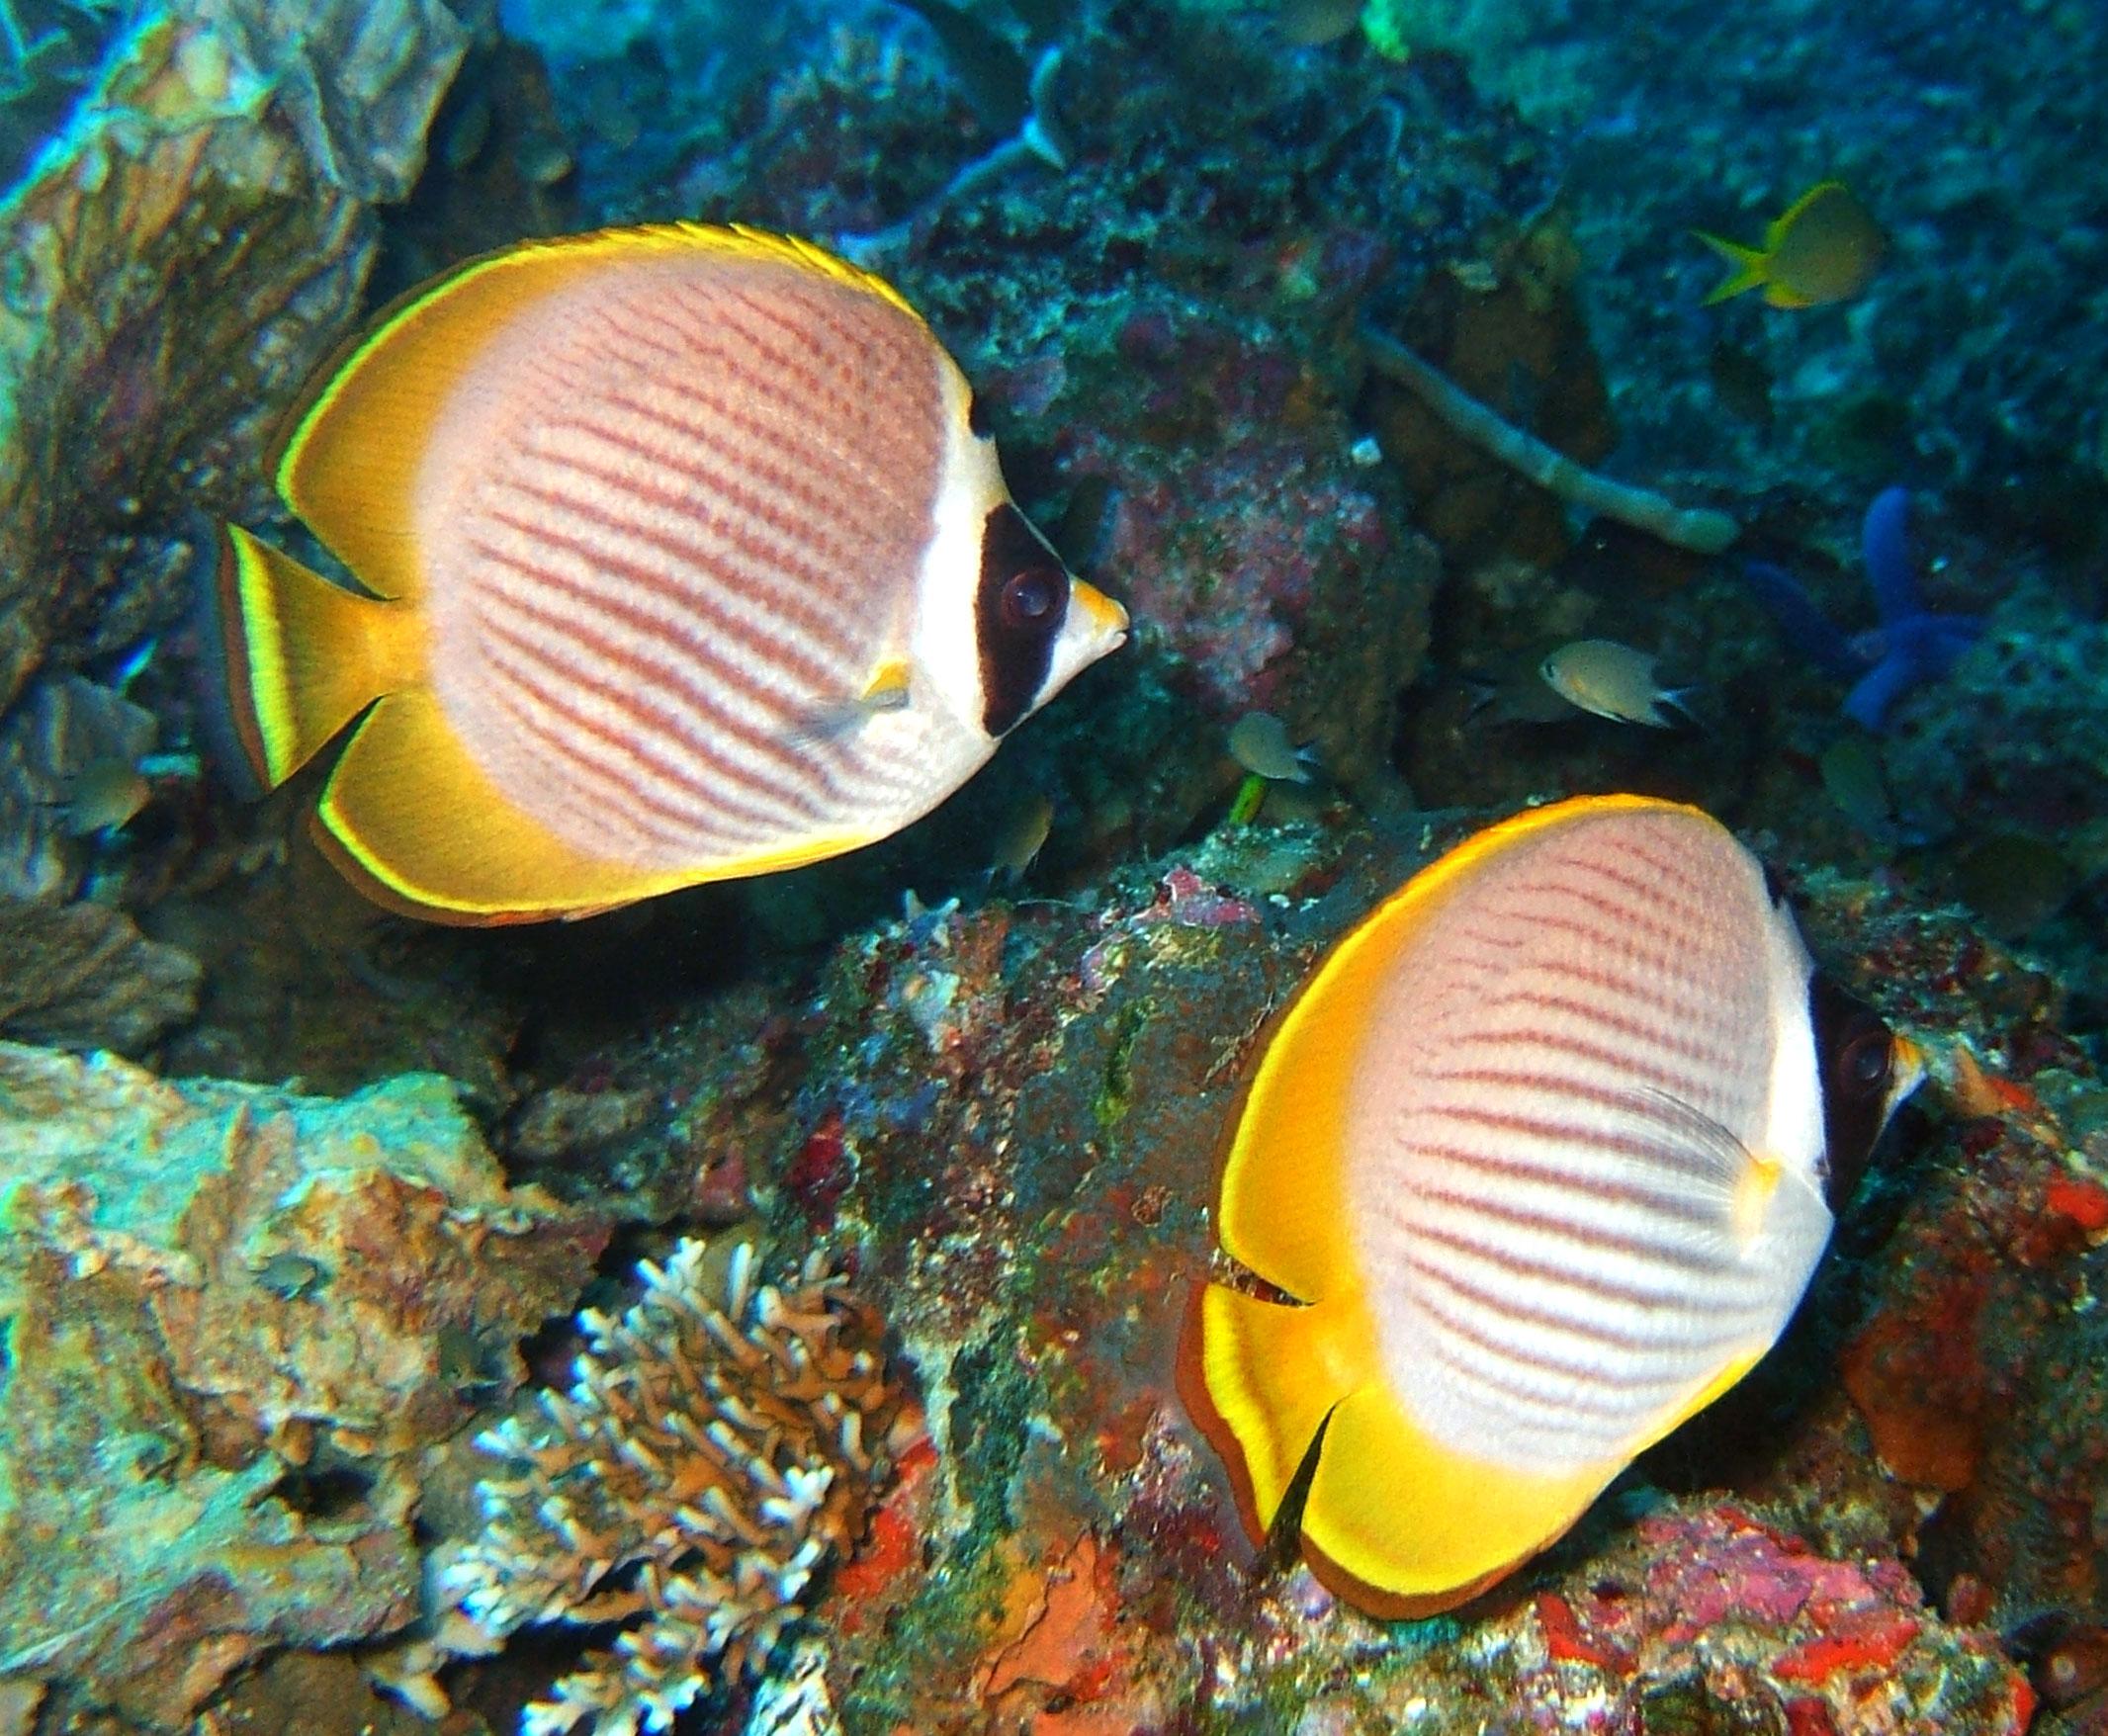 Philippines Cebu Moal Boal 20051227 Dive 1 Pescador Island 18